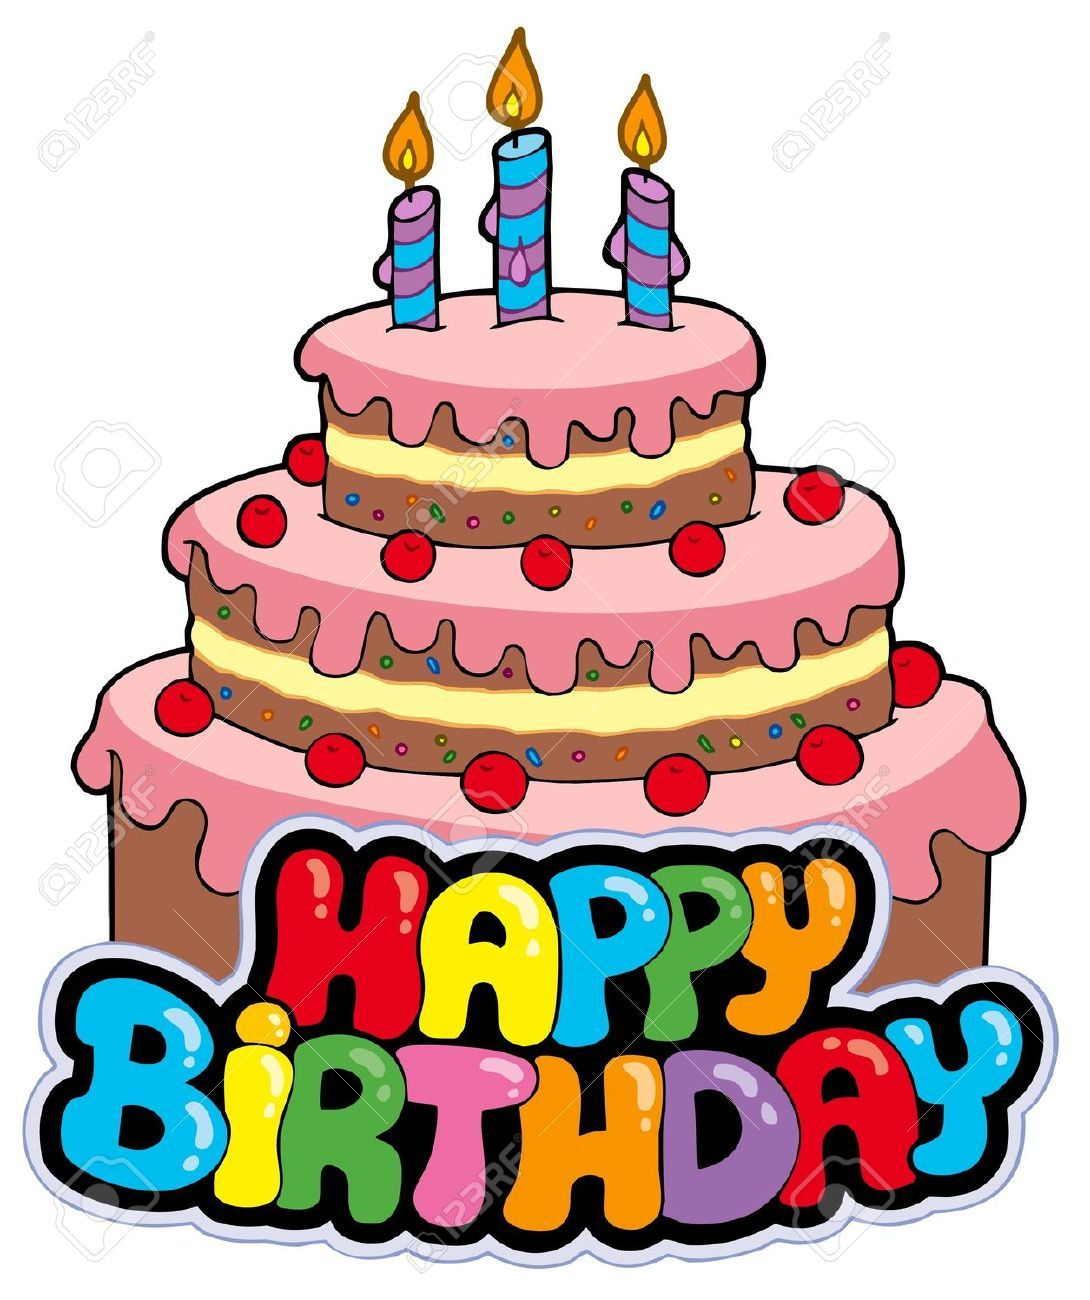 Image Birthday Cake.